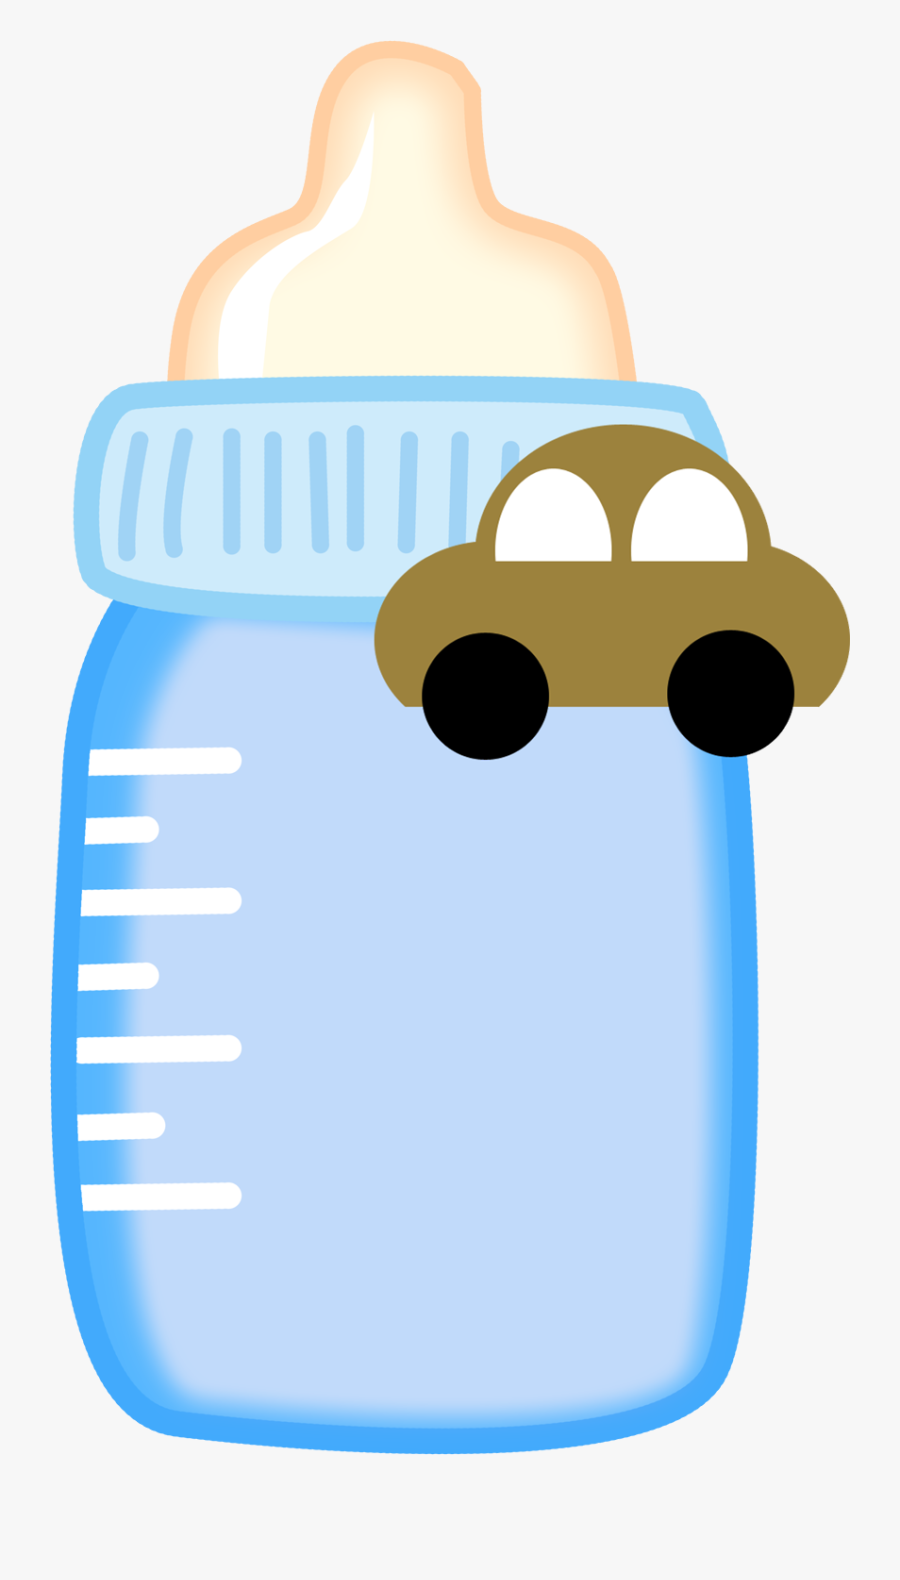 Beb Menino E Menina - Boss Baby Baby Bottle, Transparent Clipart